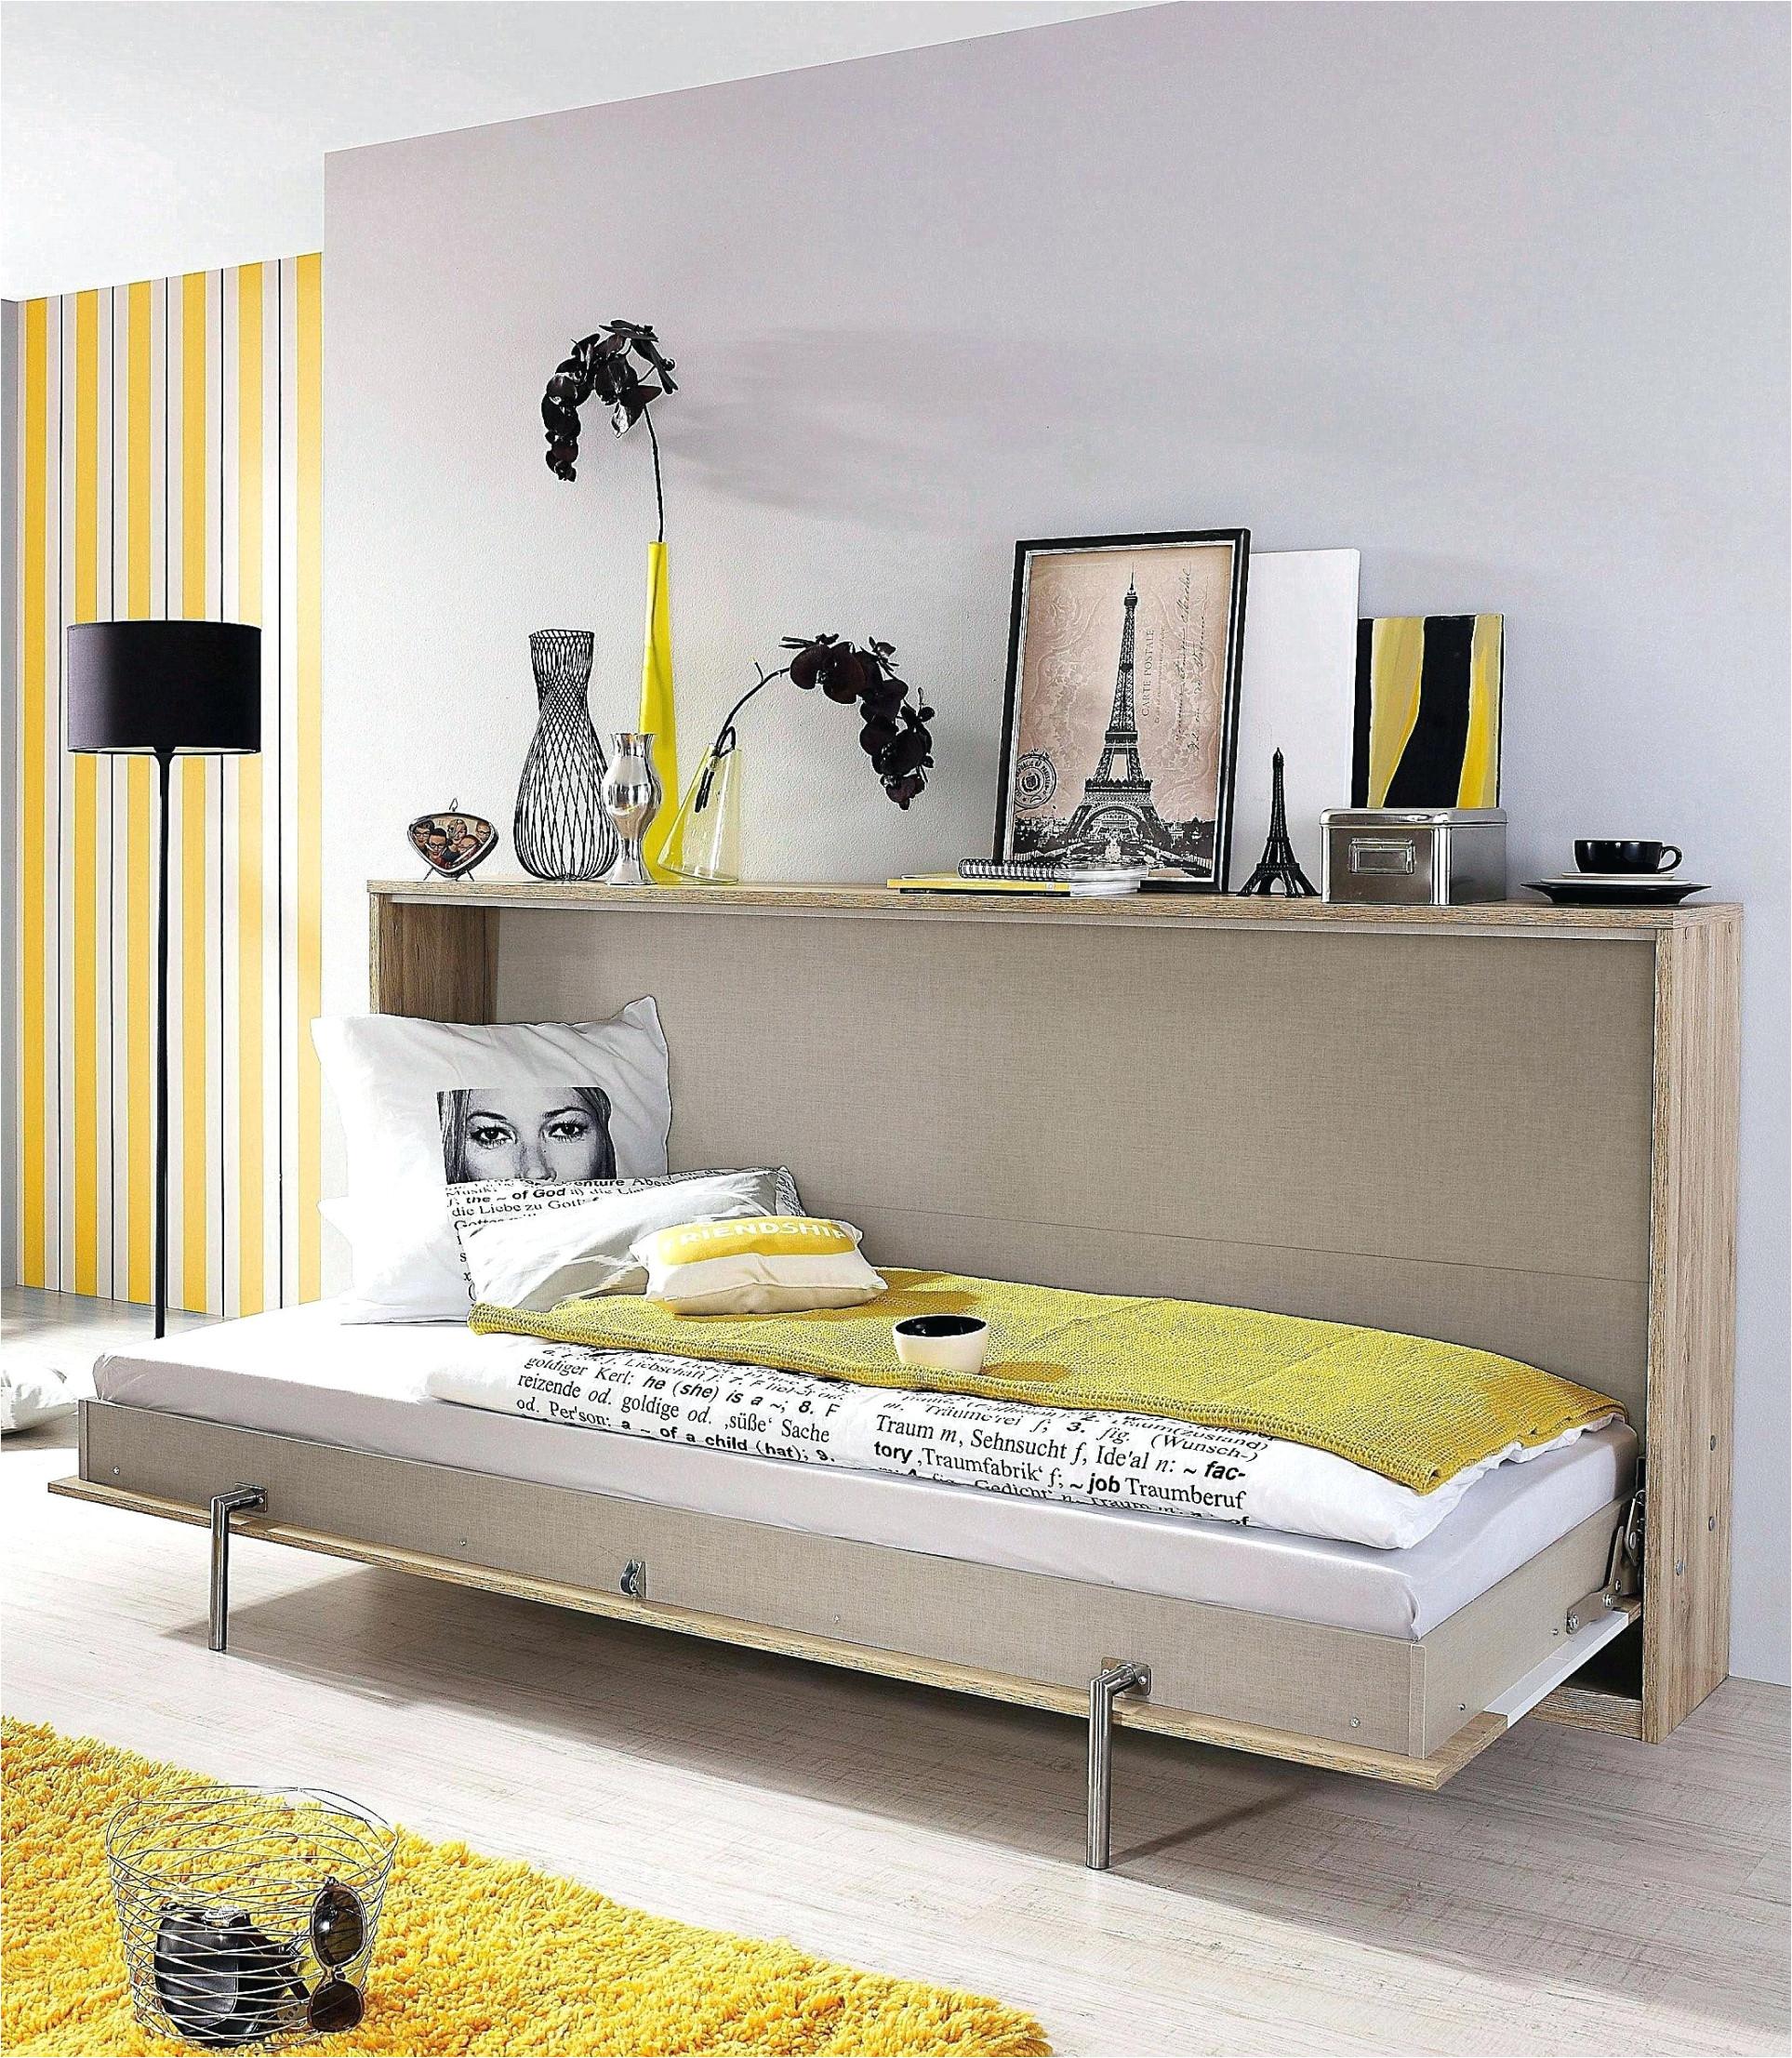 camas con palets nuevo sofa cama palets ikea